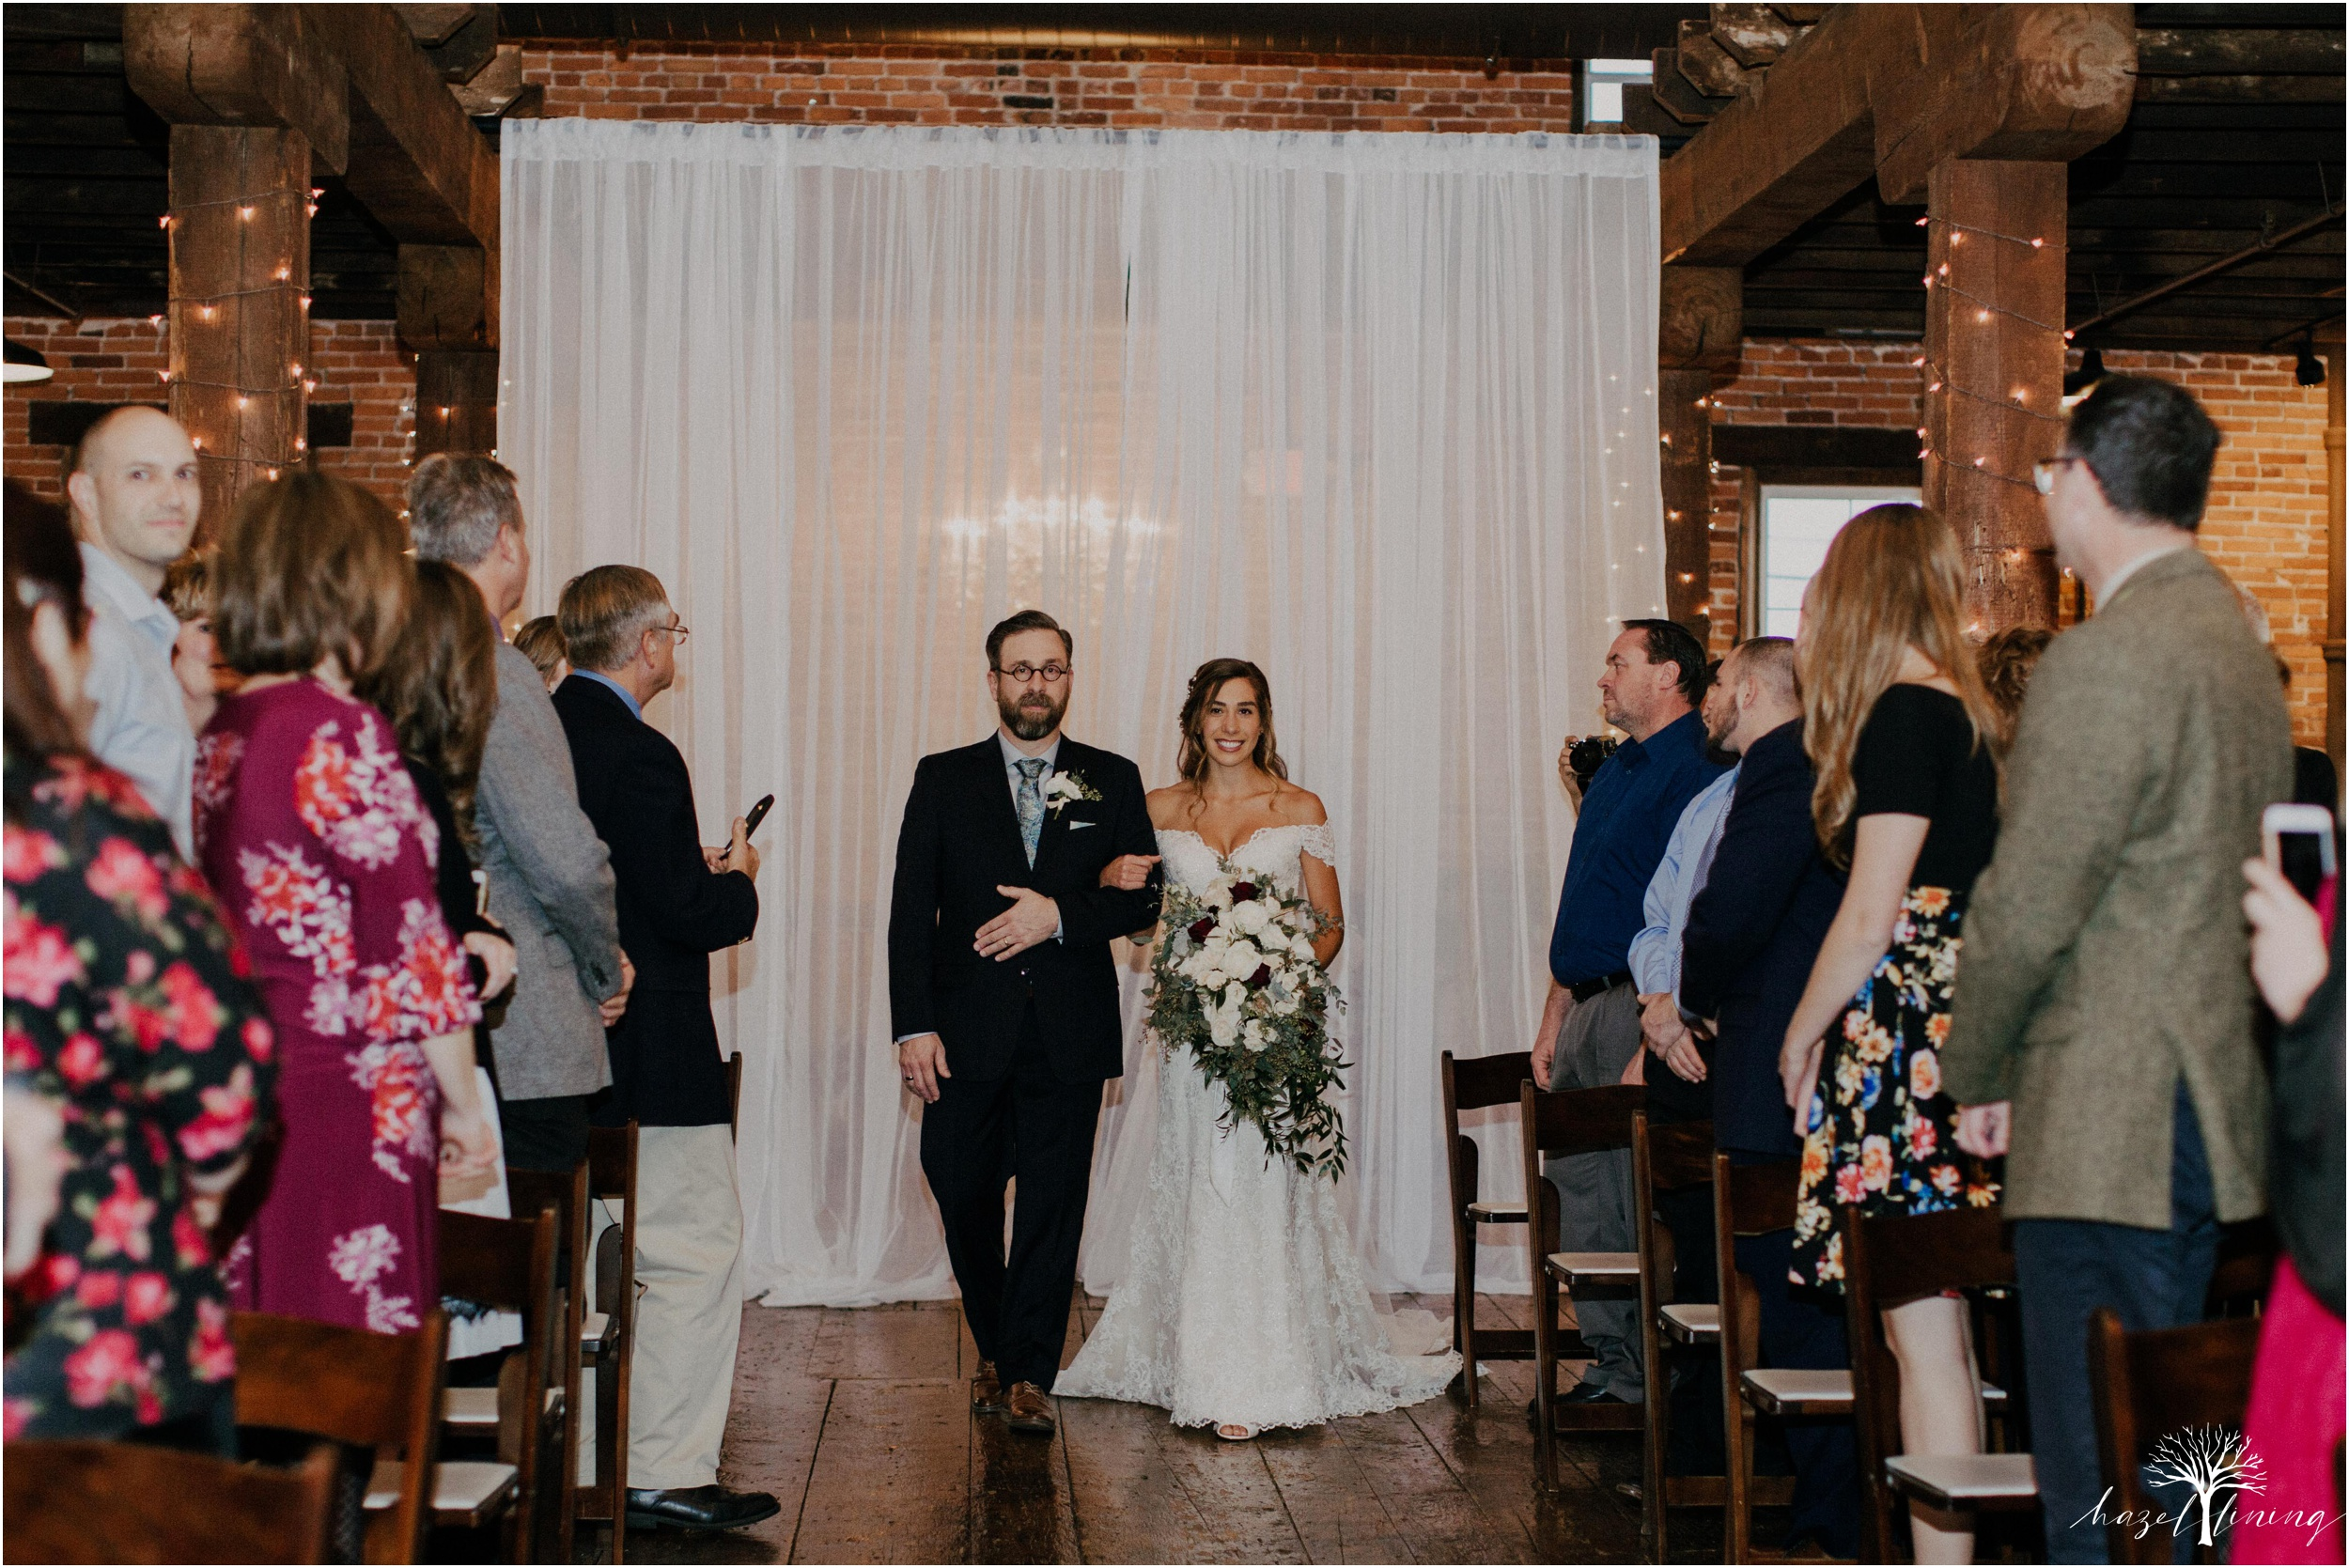 emma-matt-gehringer-the-booking-house-lancaster-manhiem-pennsylvania-winter-wedding_0049.jpg